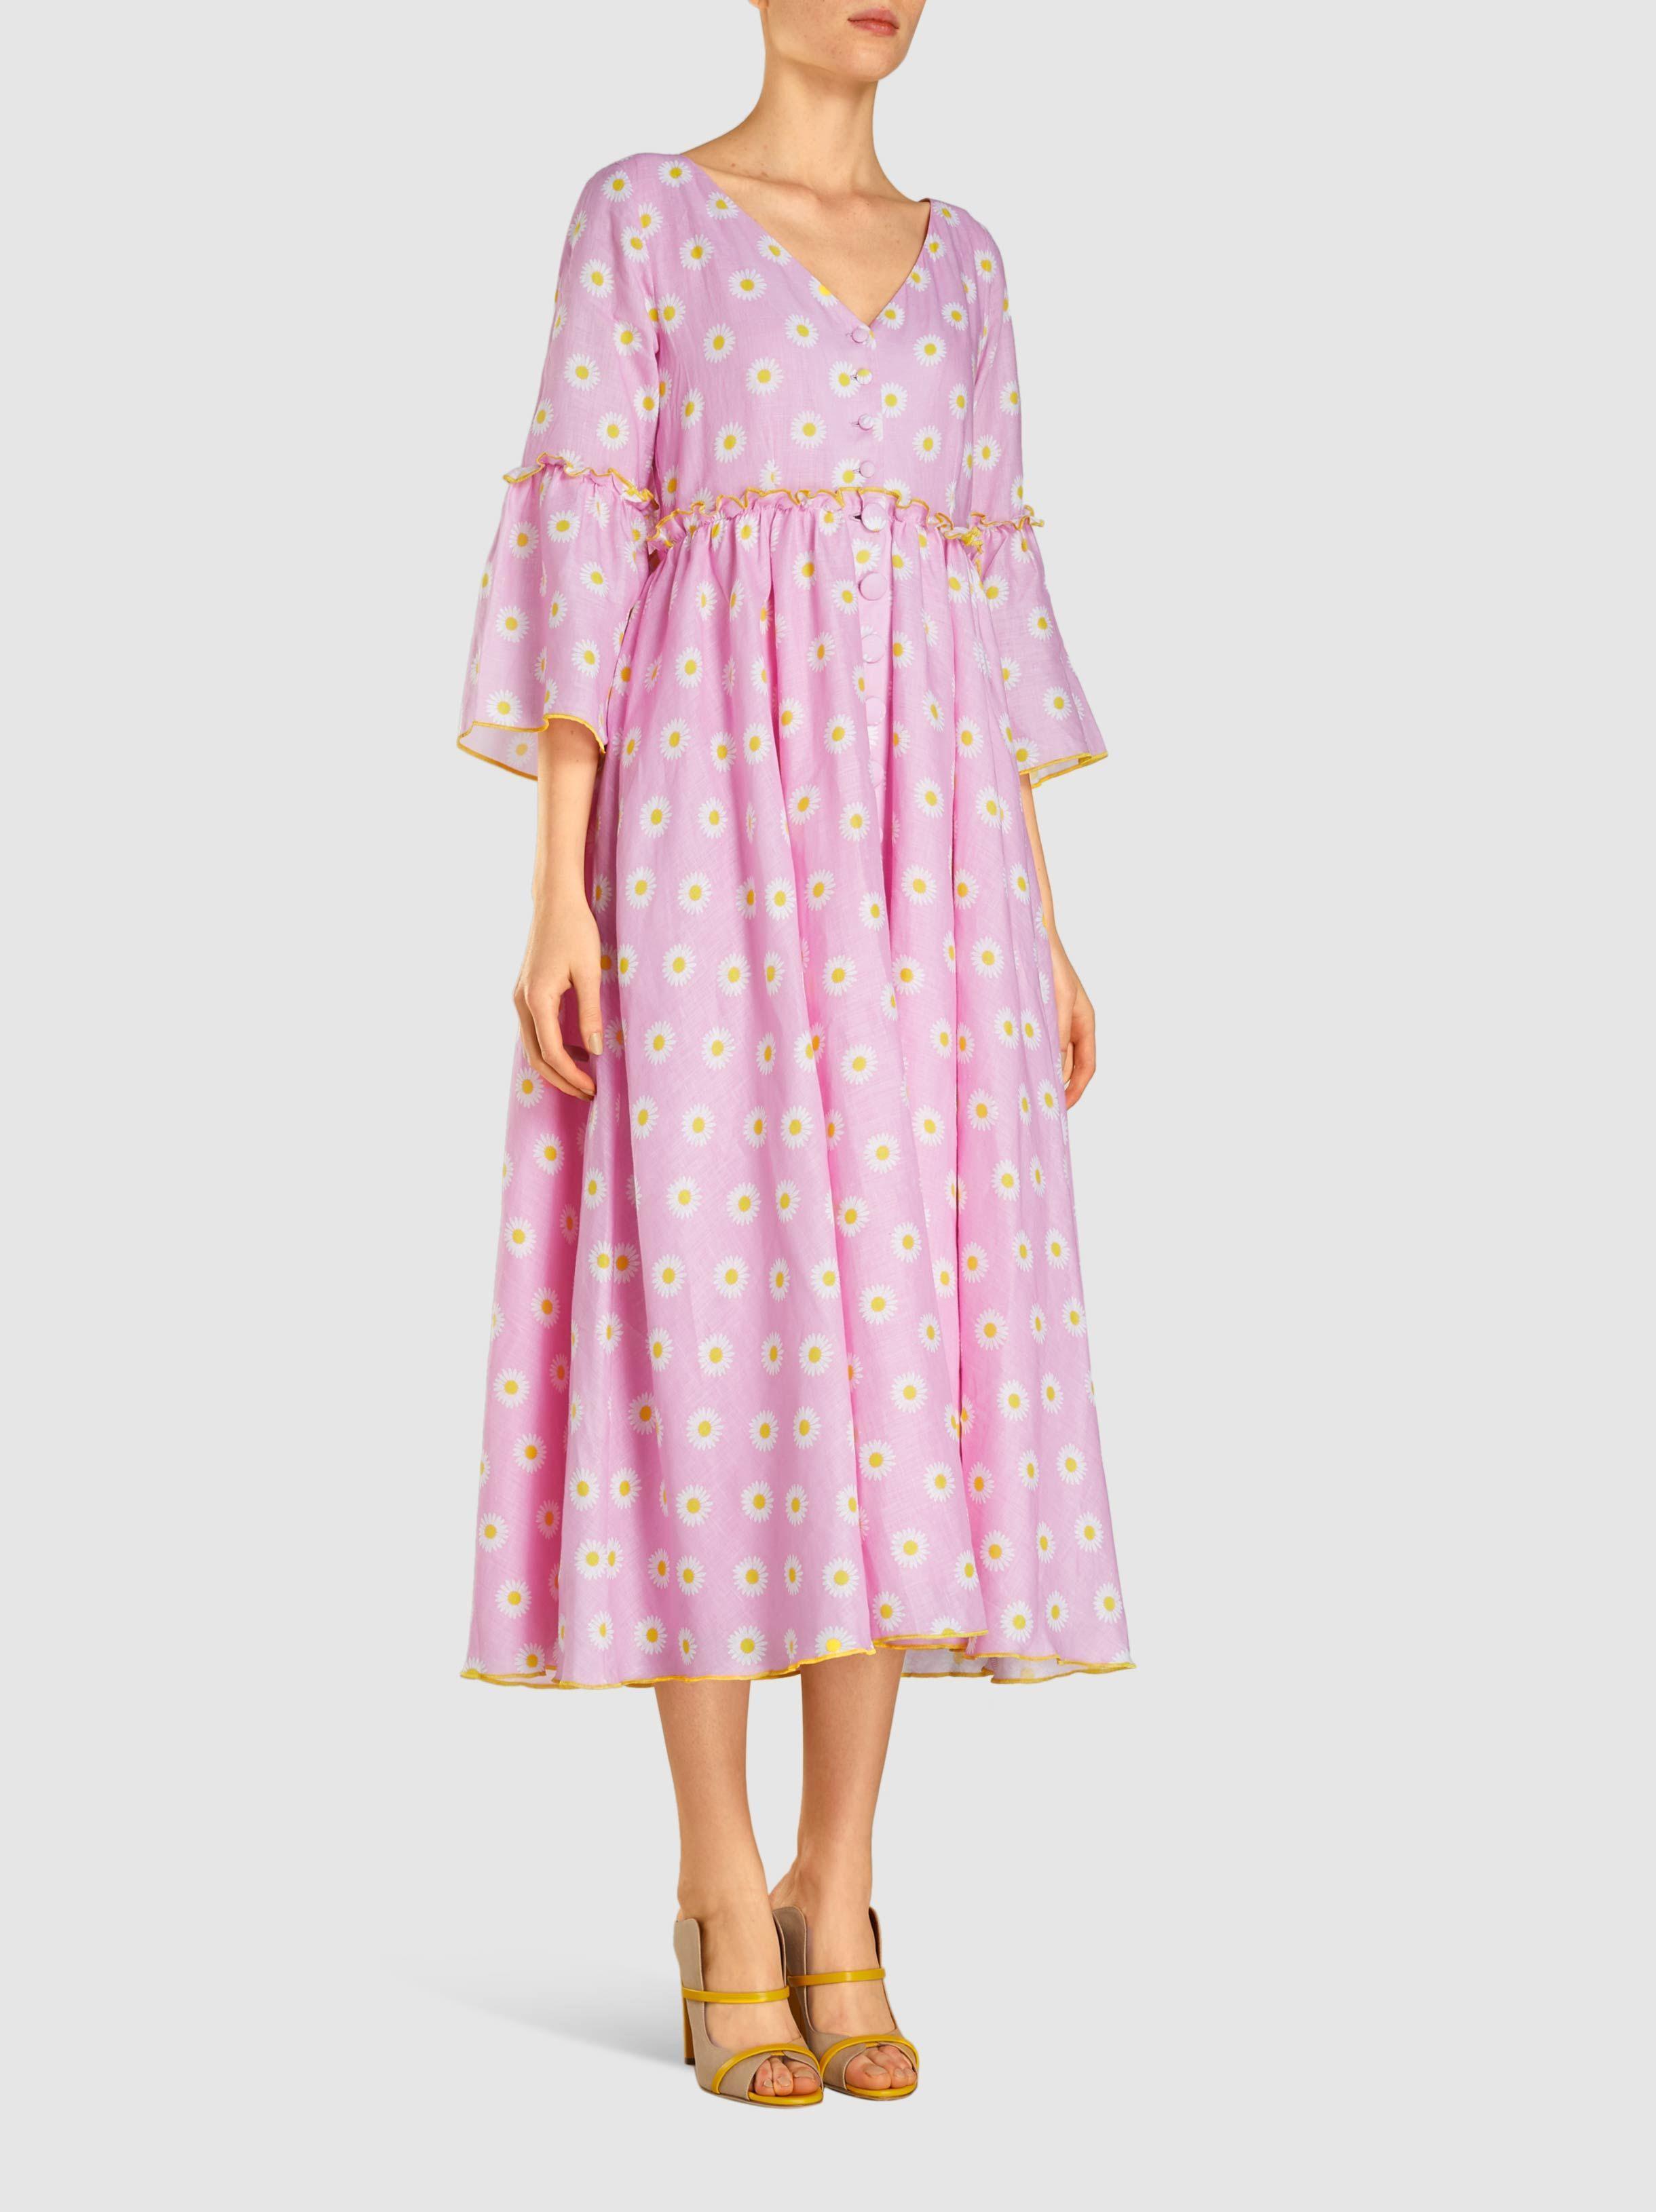 8853ad9dee Gül Hürgel Daisy Print Linen Midi Dress in Pink - Lyst